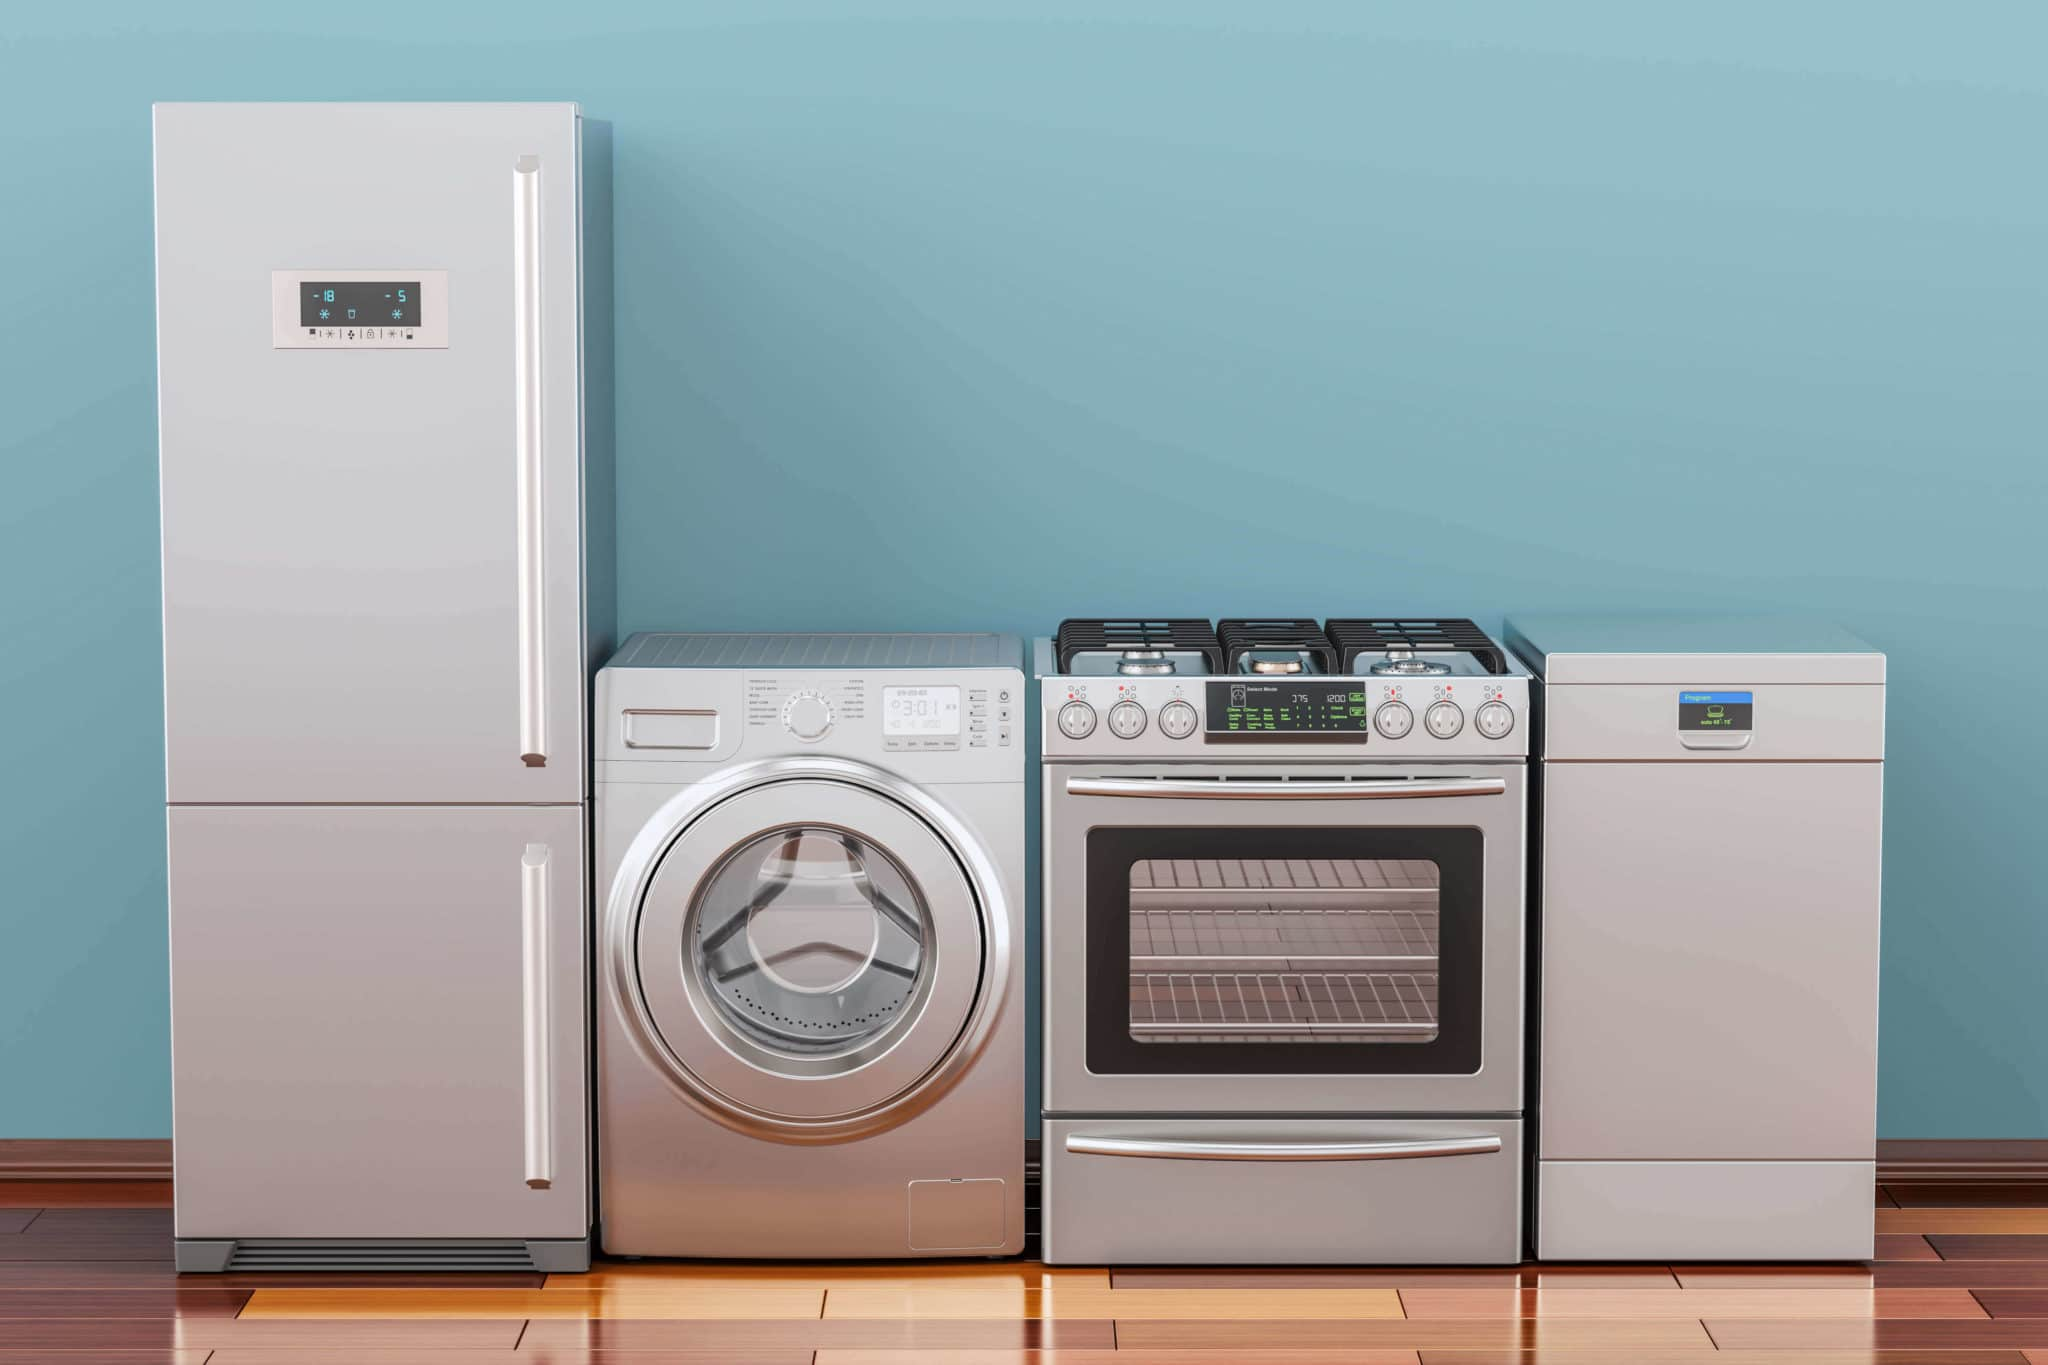 Errores diseño cocina - Electrodomésticos